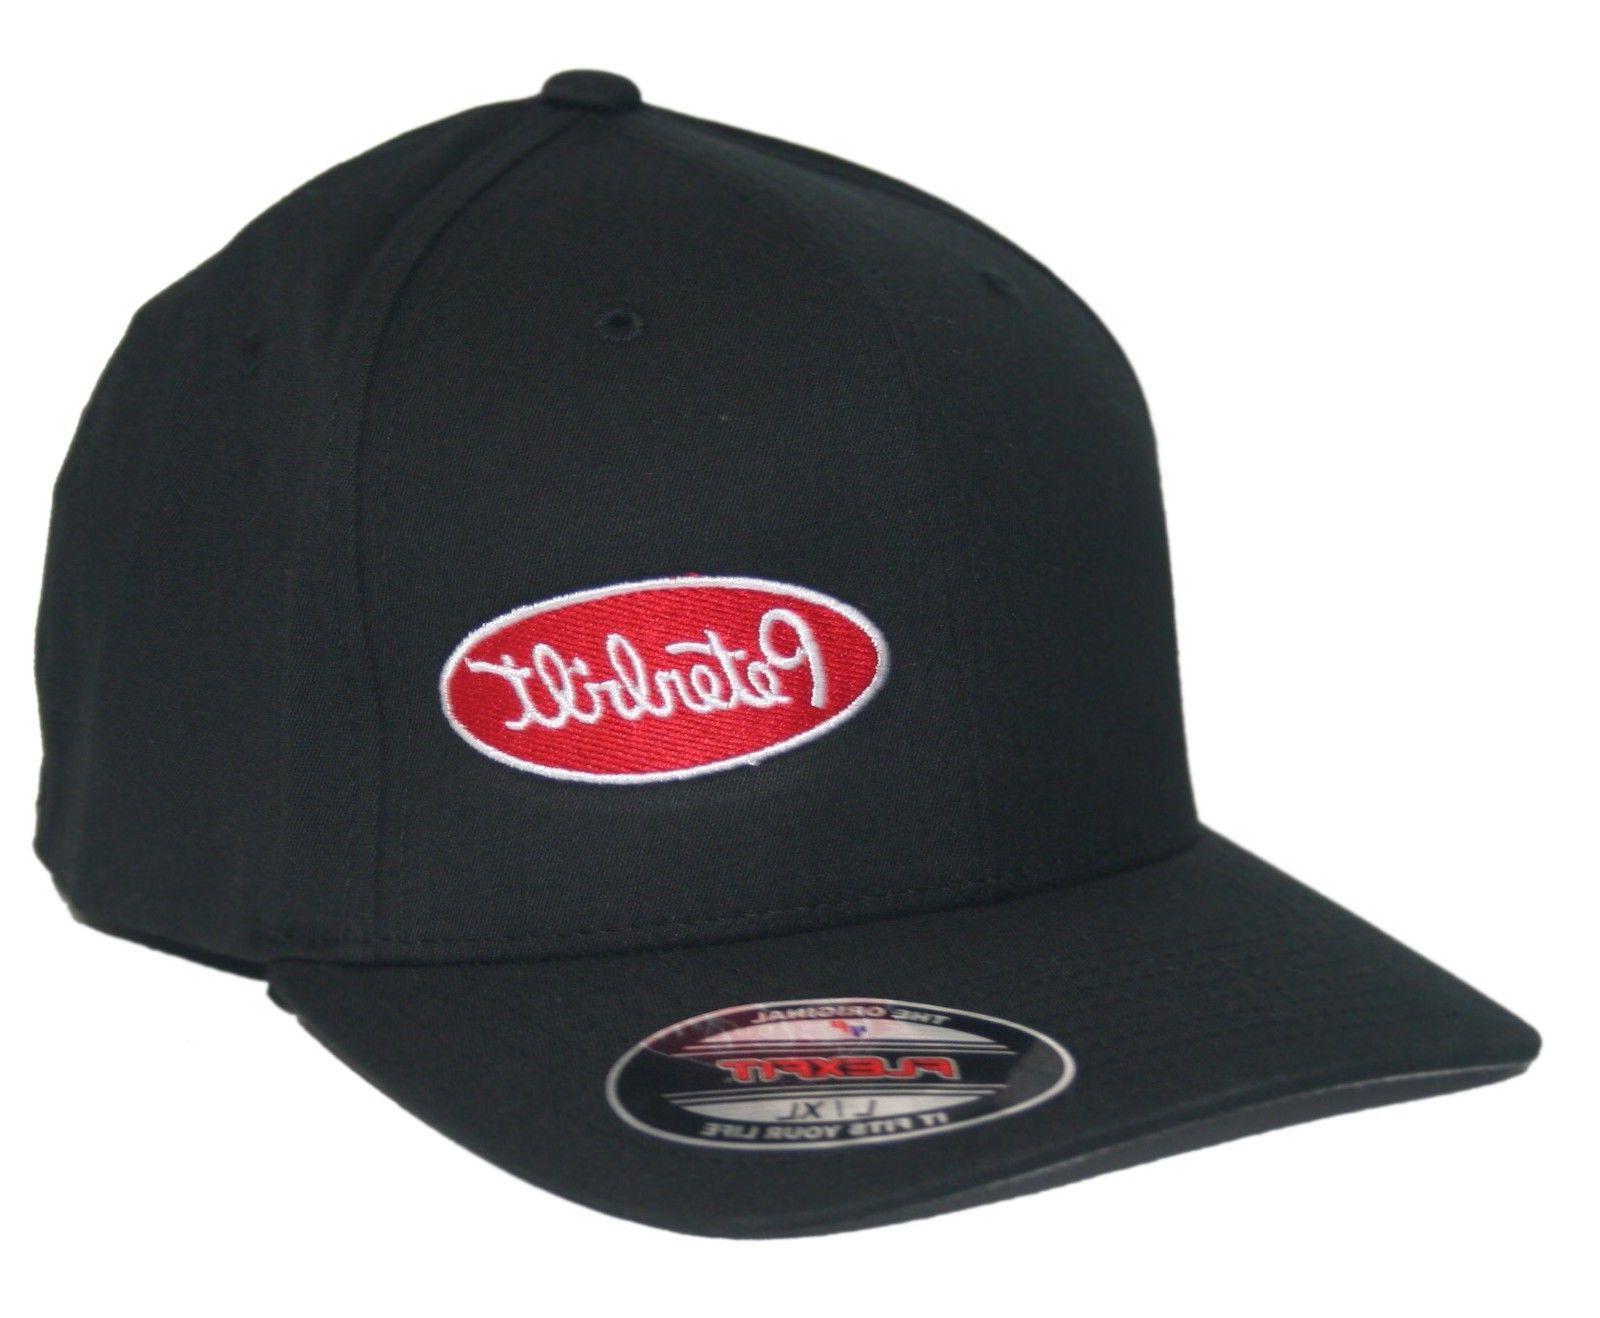 Peterbilt hat cap fitted flexfit curved bill Trucker Truck R